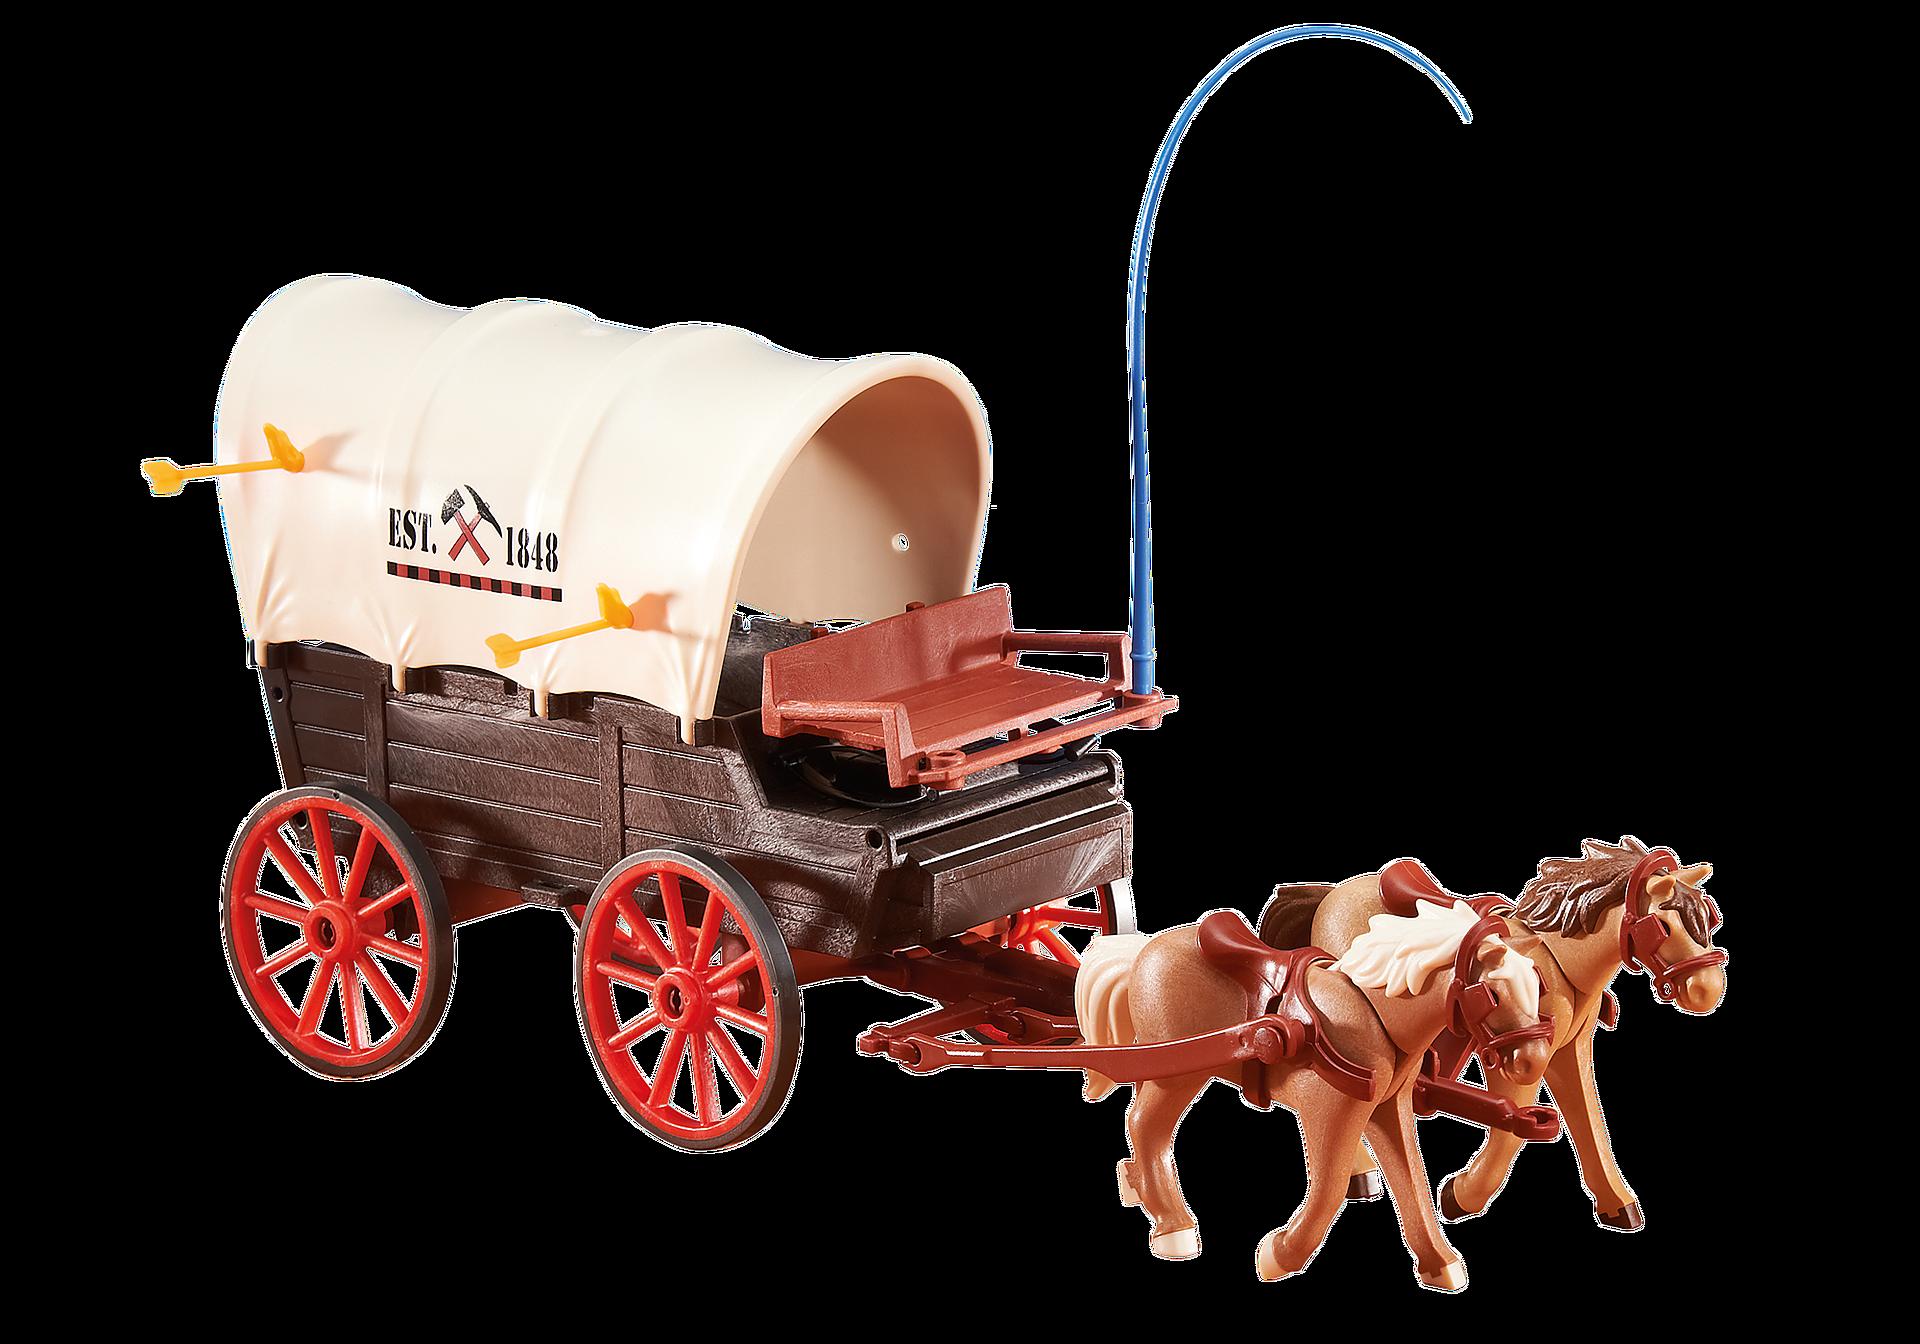 http://media.playmobil.com/i/playmobil/6426_product_detail/Caravana del Oeste